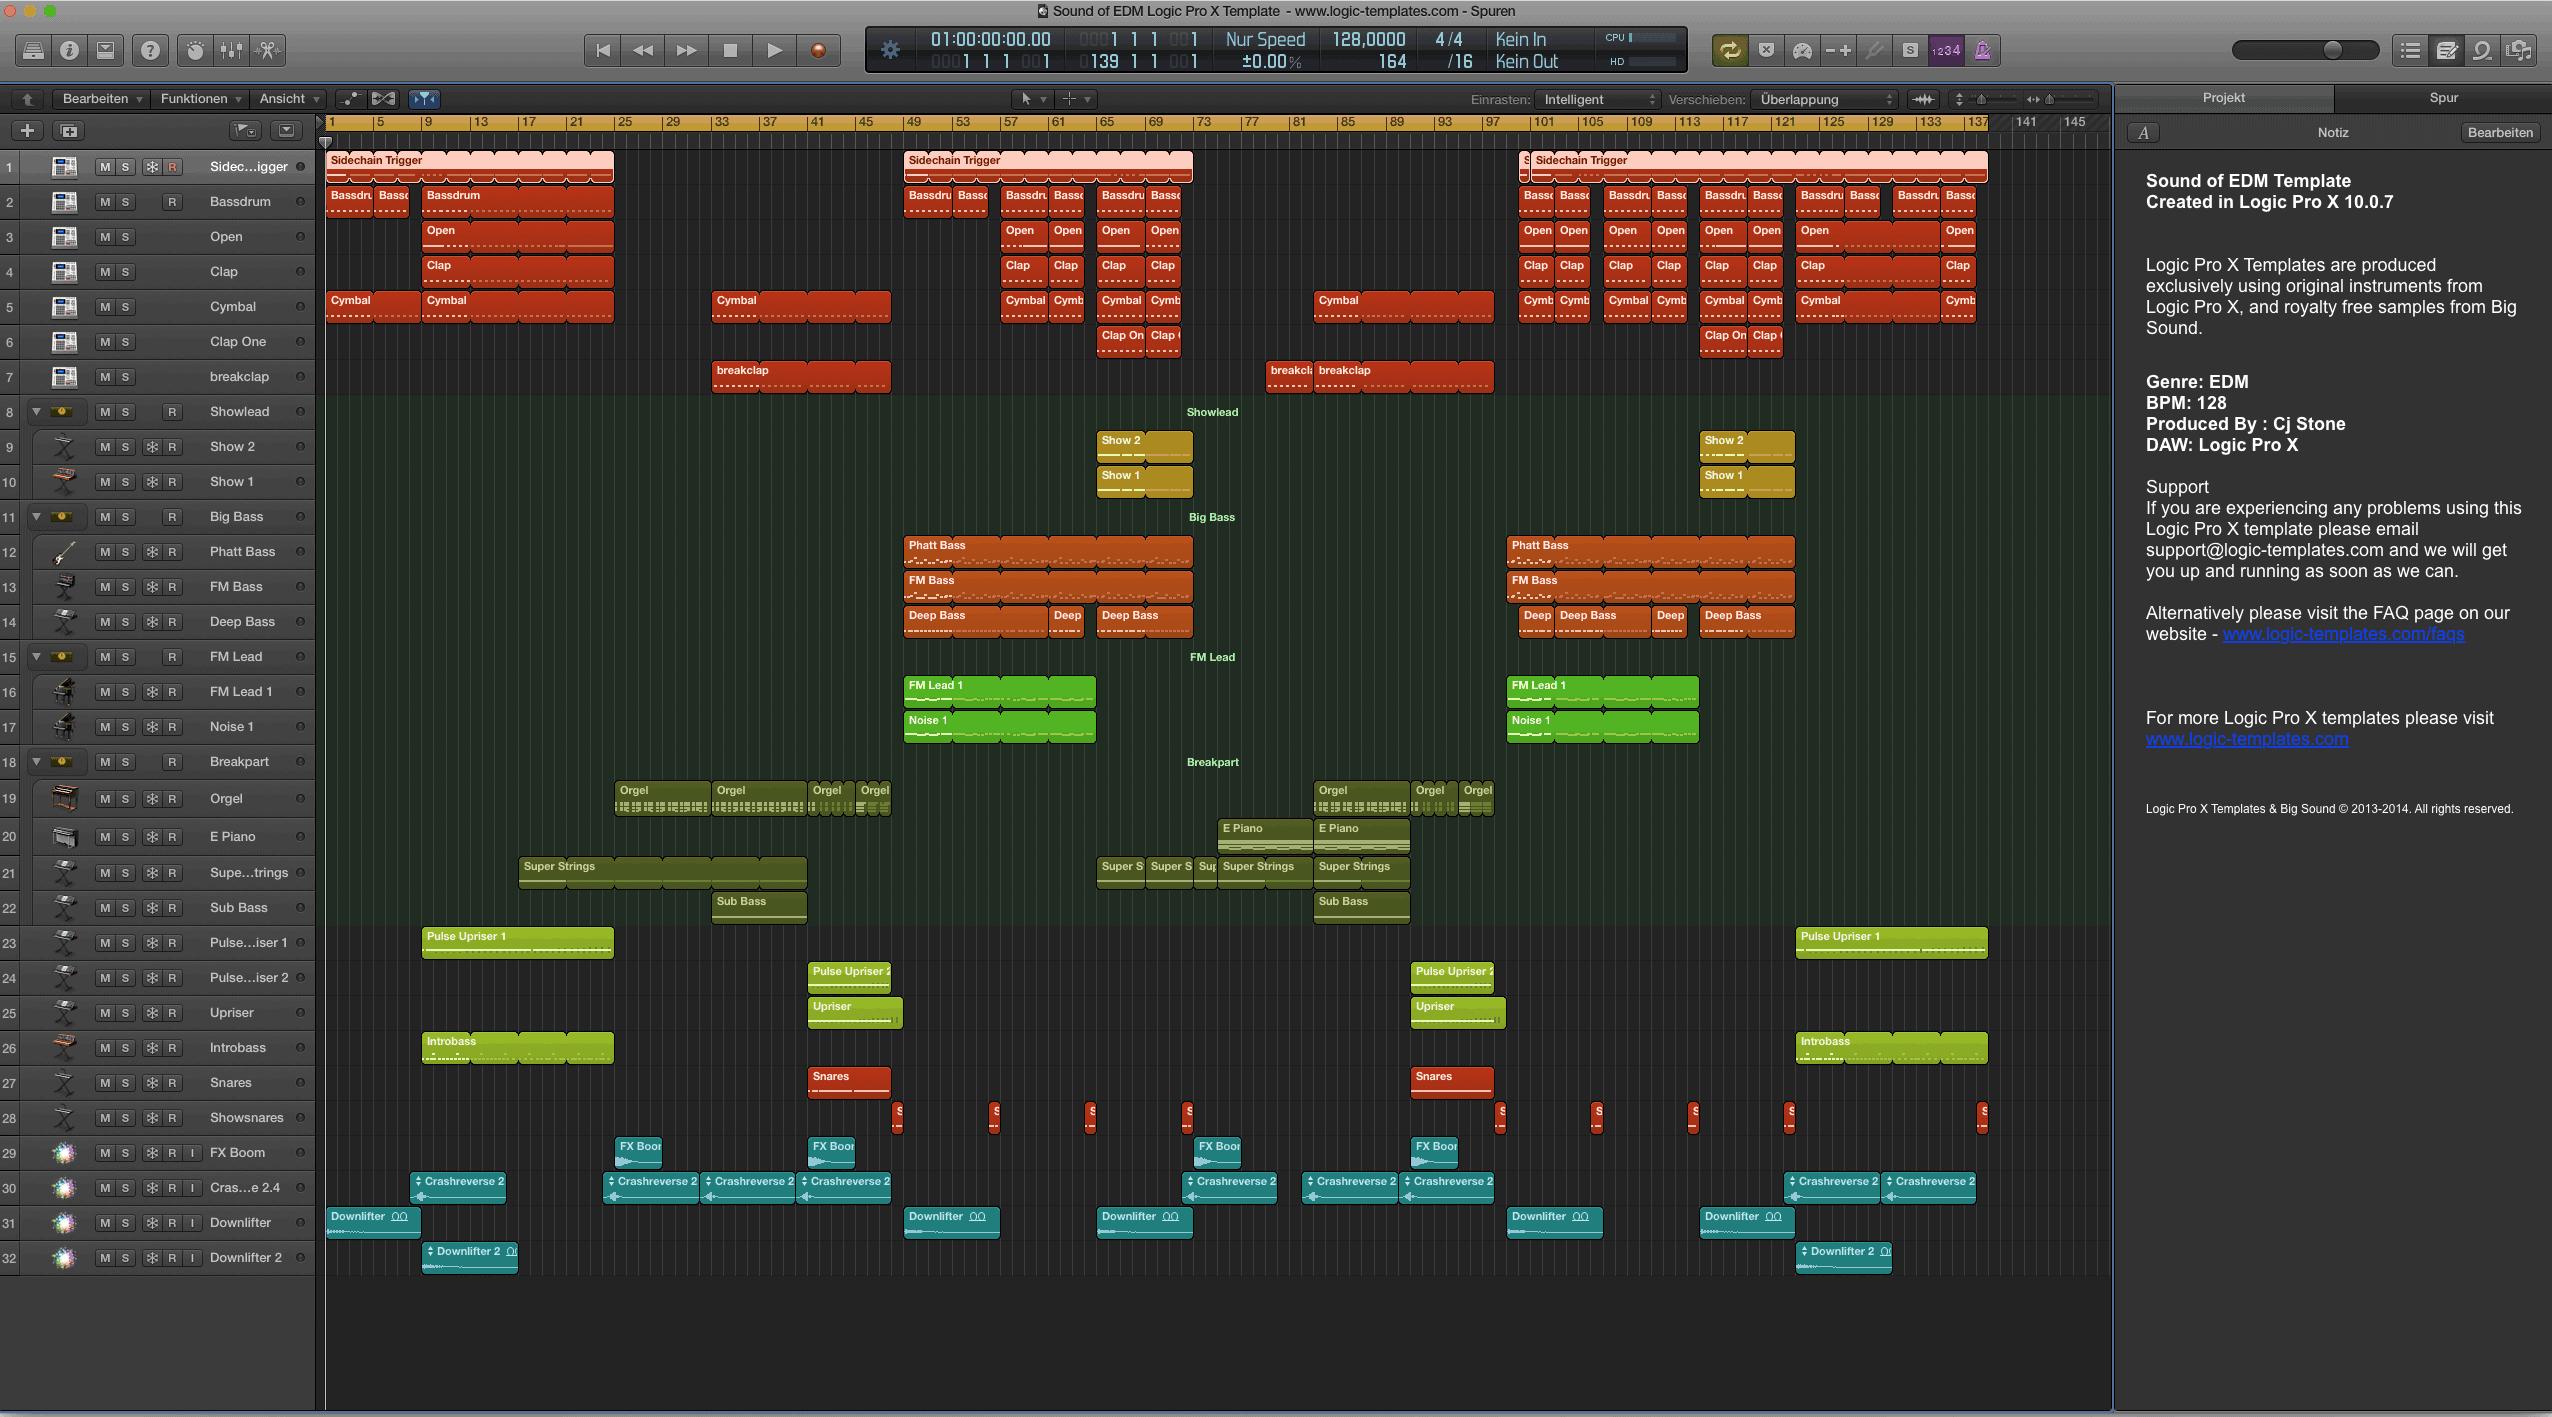 Sound of EDM Logic Pro X Template